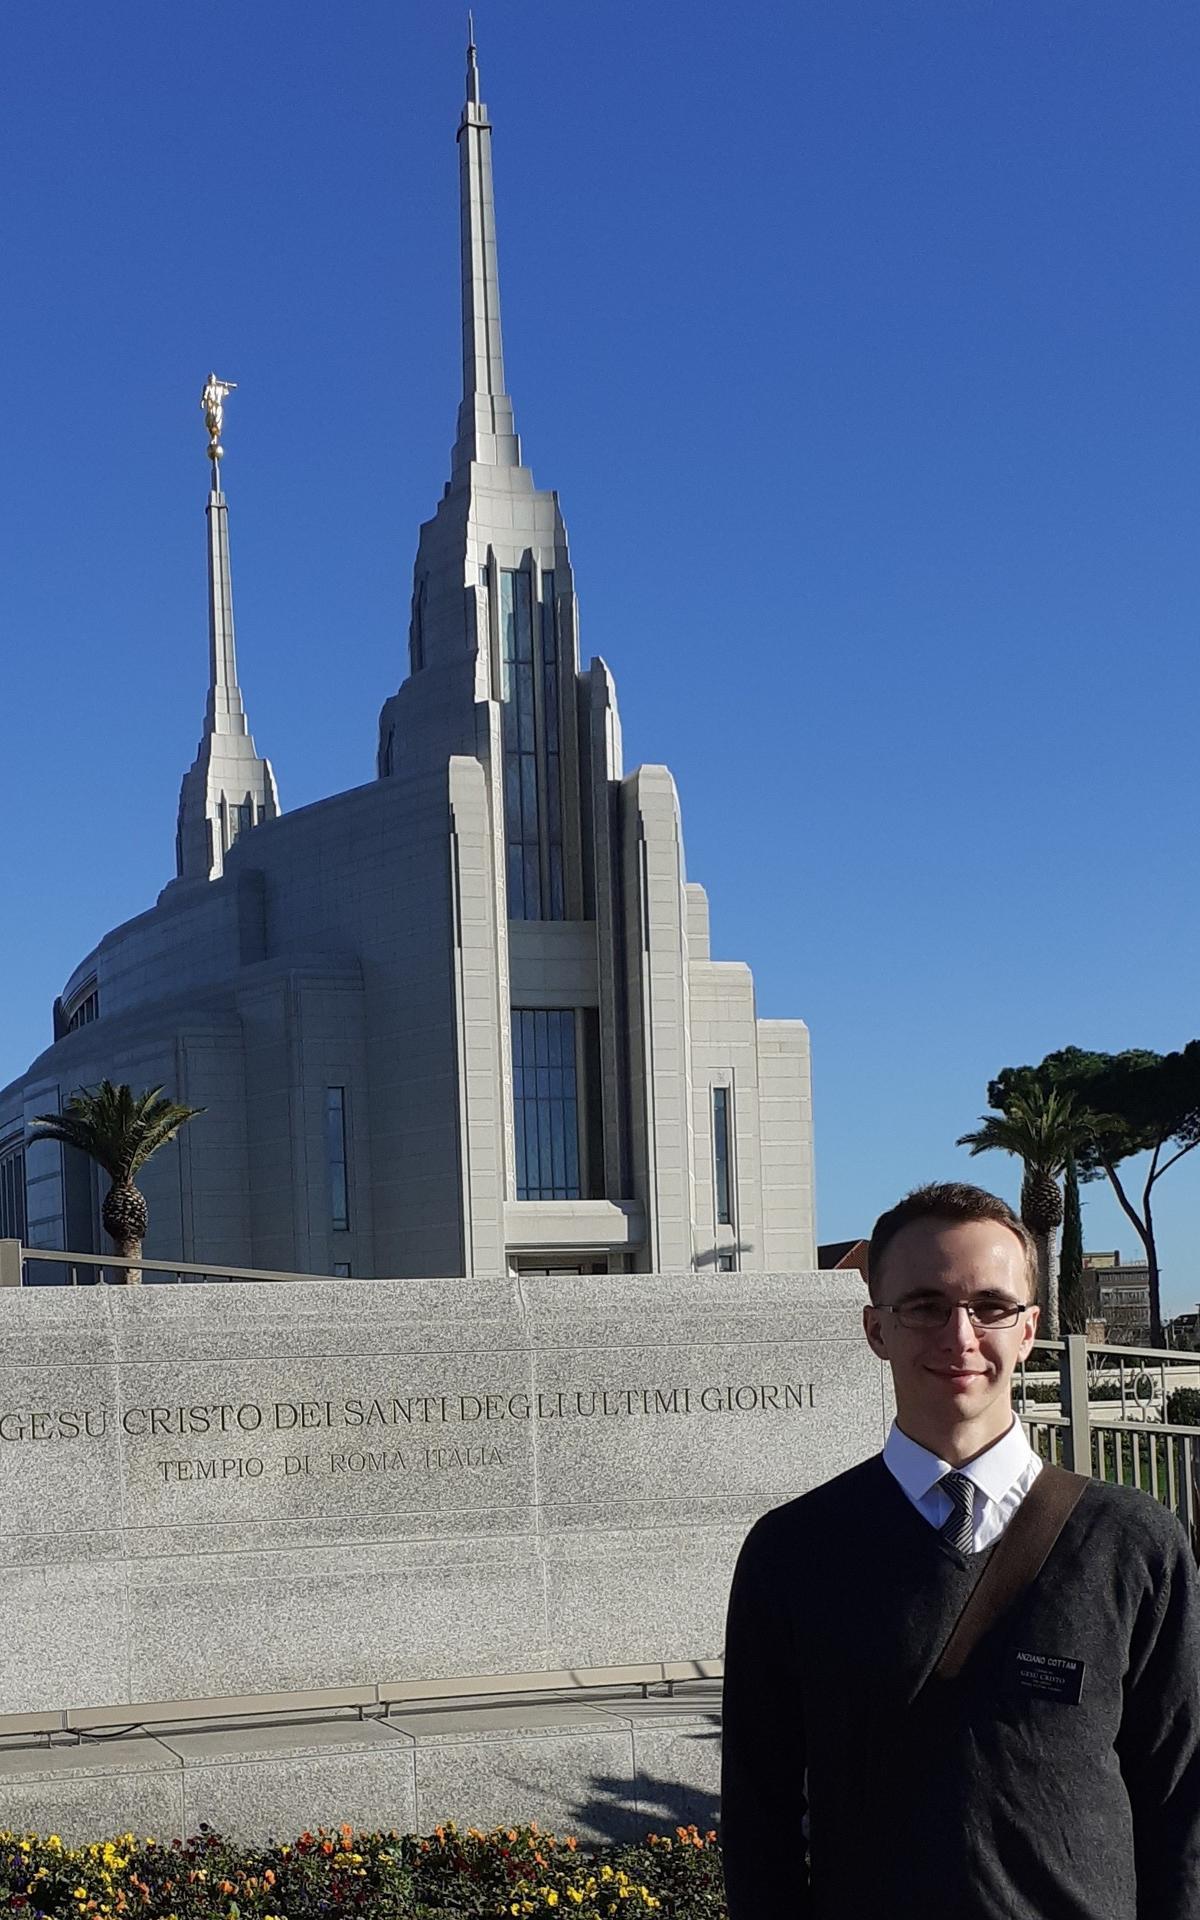 Elder Daniel Cottam next to the temple